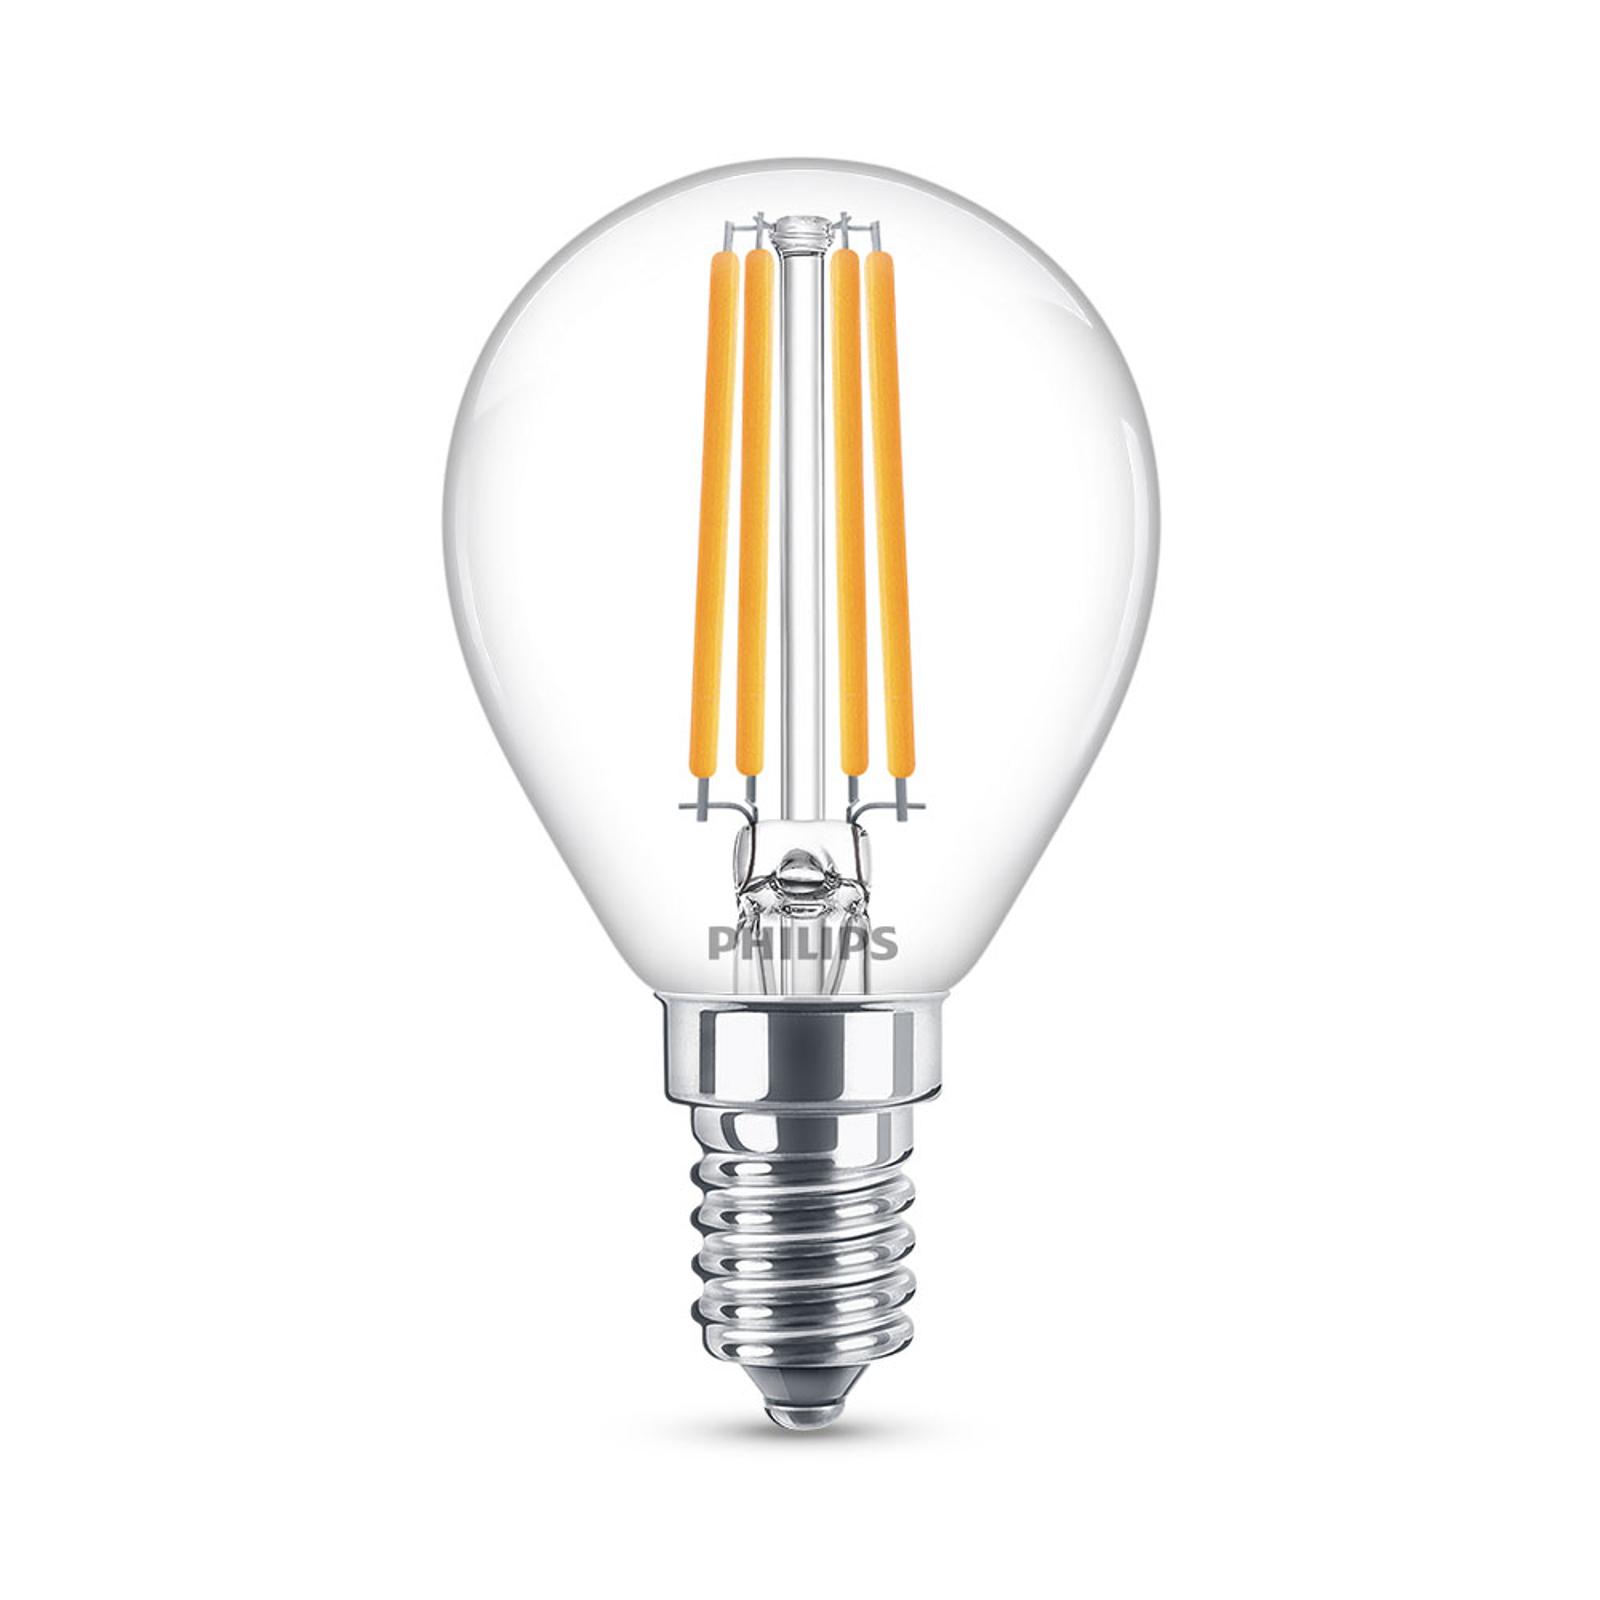 Philips Classic LED-lamppu E14 P45 6,5W 4000K